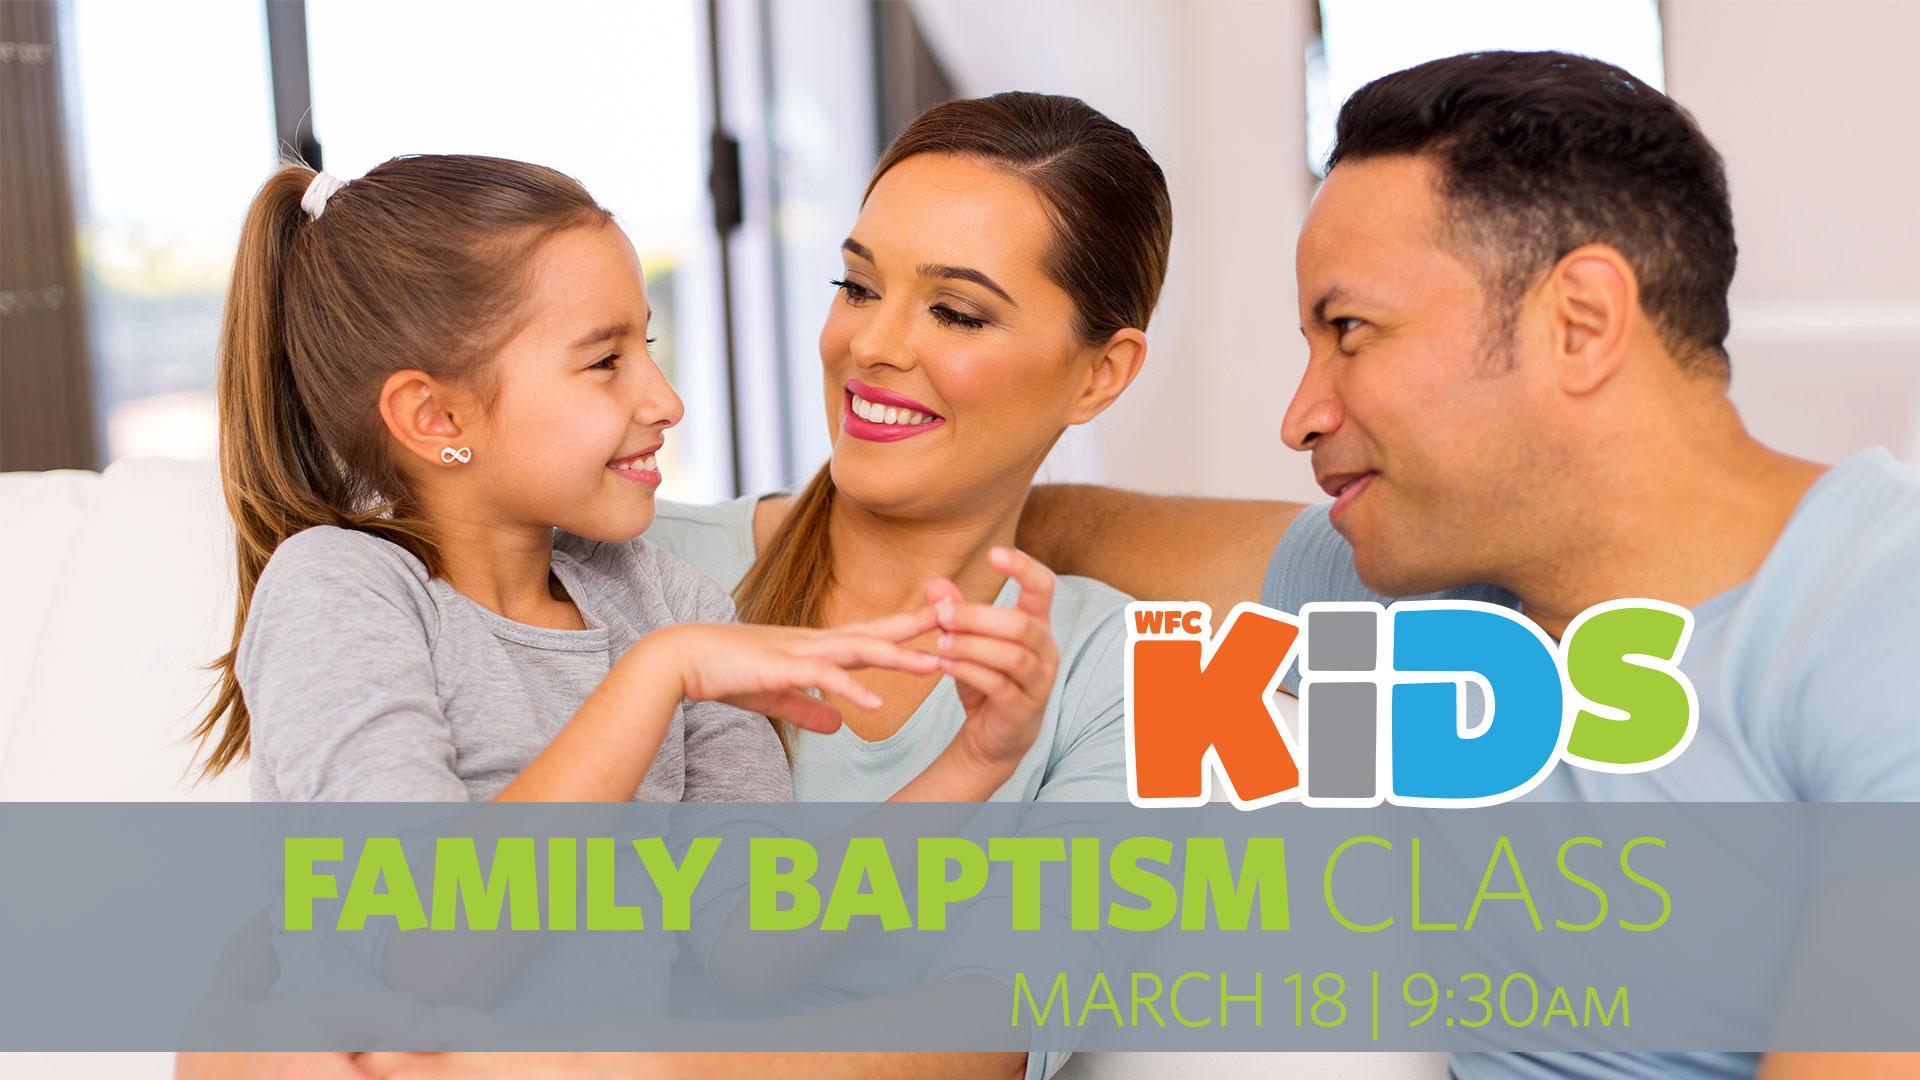 KiDS-Baptism-Class-web-post.jpg